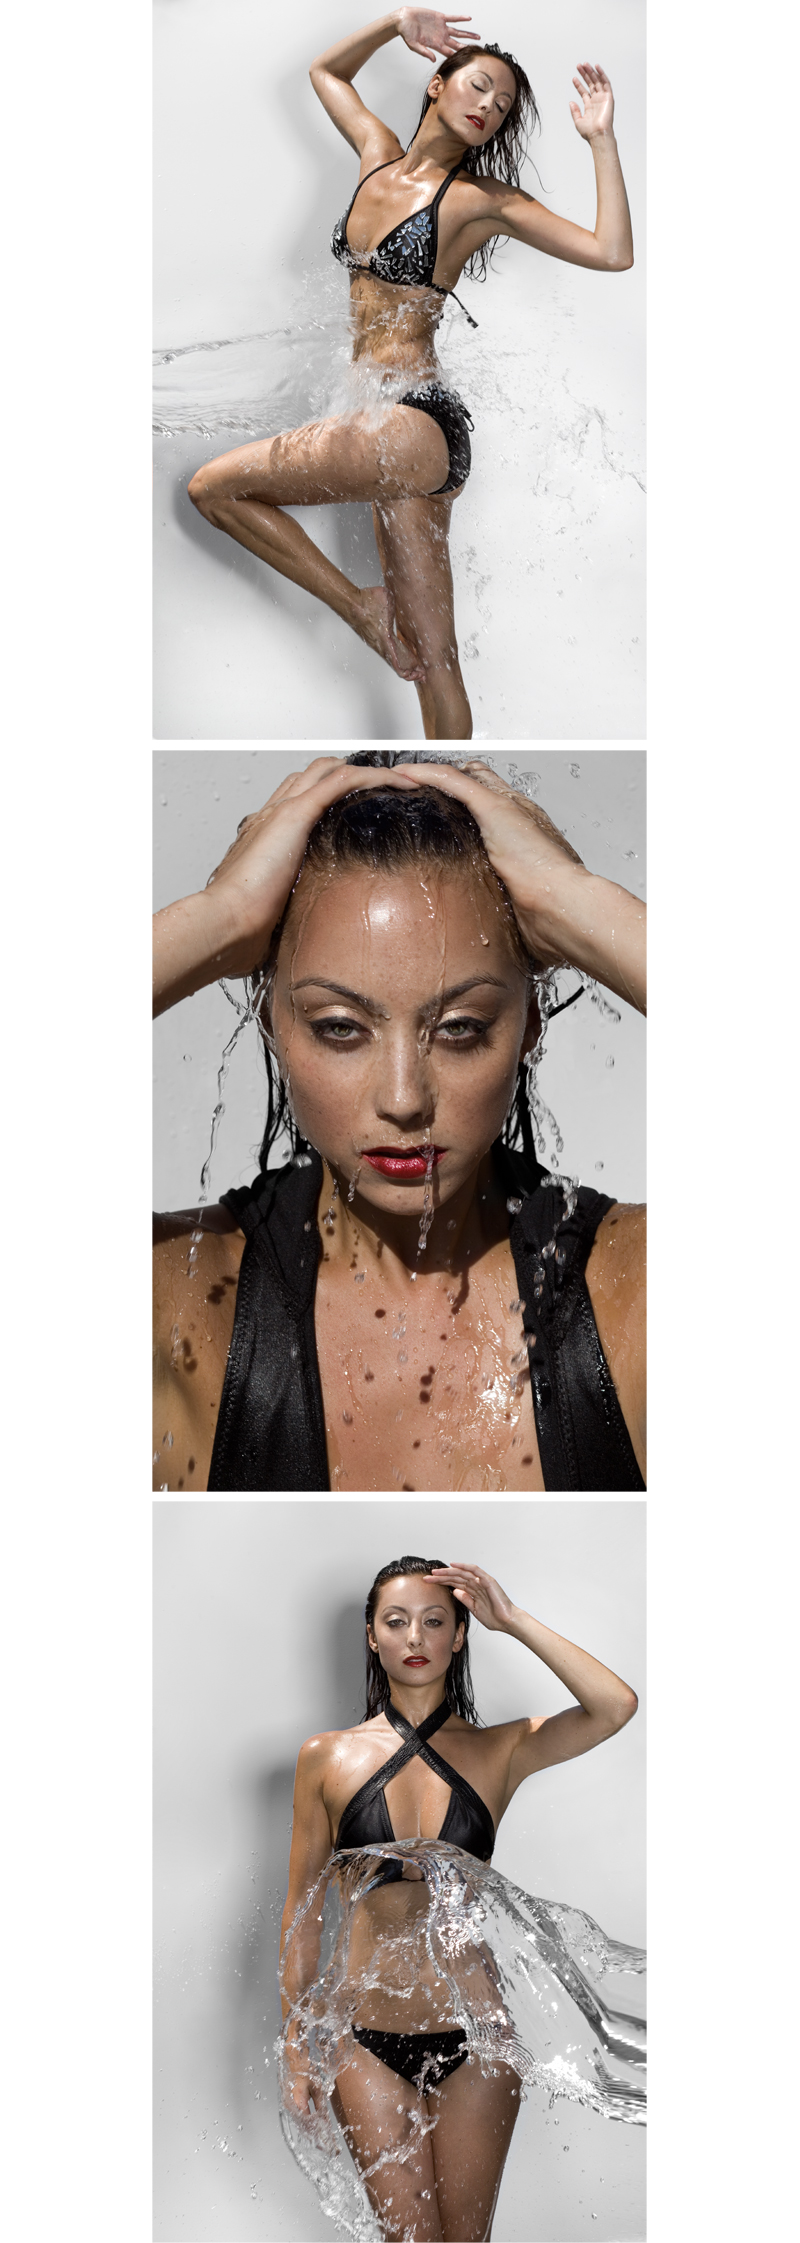 May 10, 2009 BrianWalshImages Remarquable Designs By Essence, Model - Melissa , Make up Jenna Elise